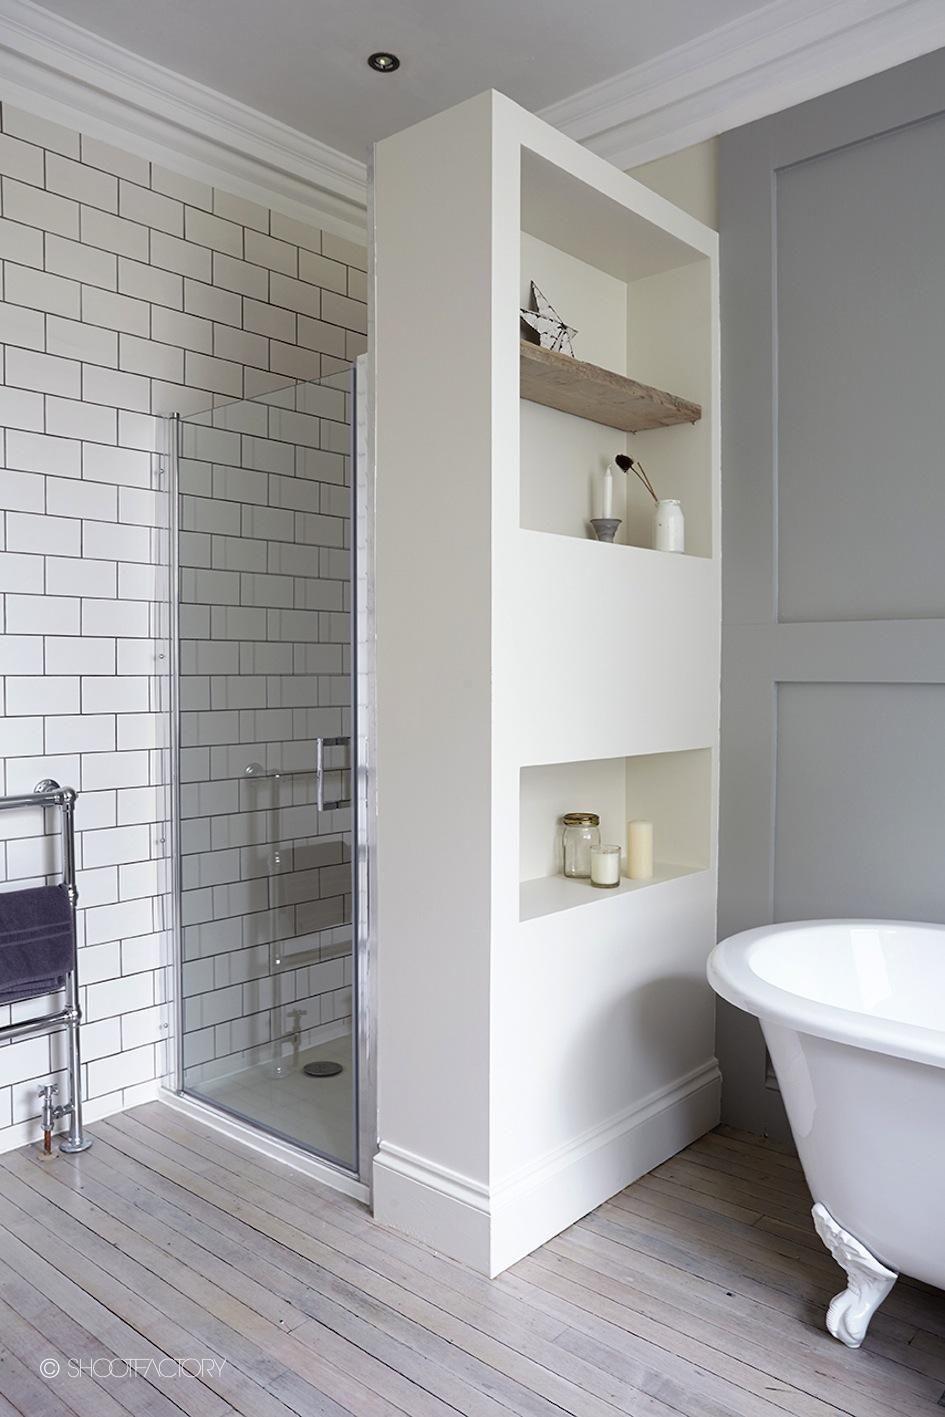 great small shower shootfactory london houses beckenham london br3 - Bathroom Ideas London